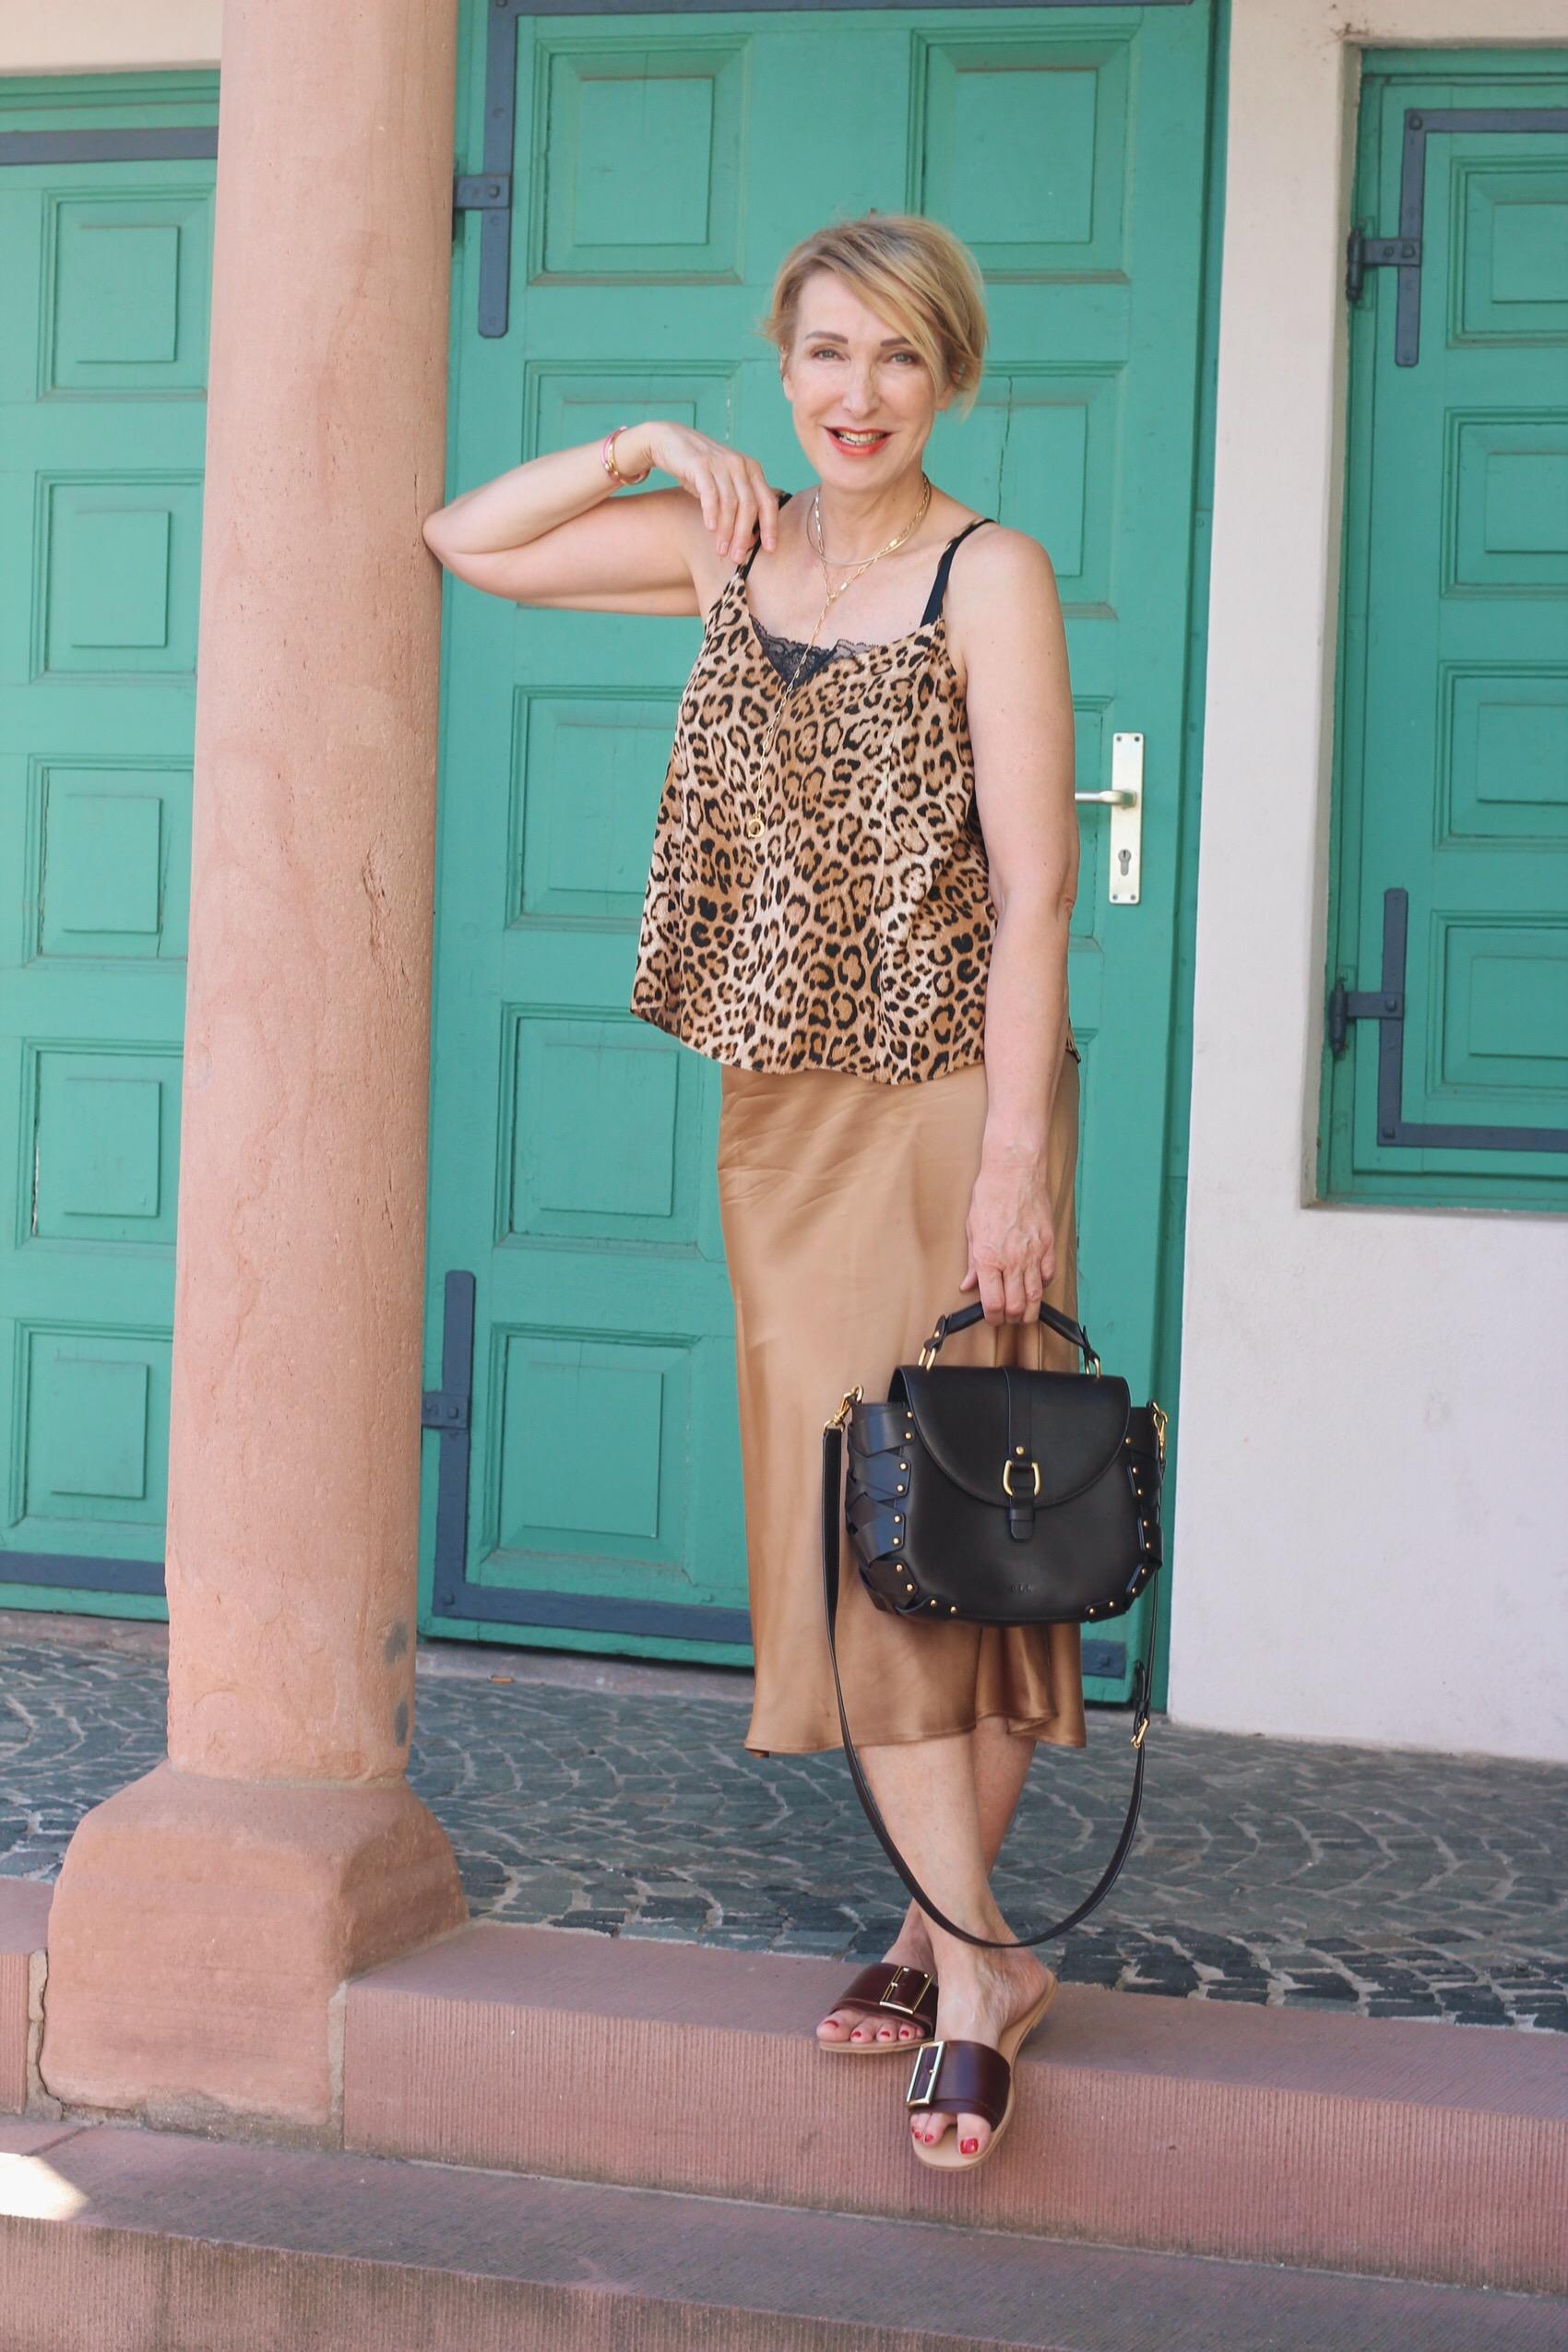 glamupyourlifestyle trendfarbe braun kombinieren Sommerbraun Modeflüsterin Sommer-Outfit ü-40-blog ü-50-blog ue-40-blog ue-50-blog